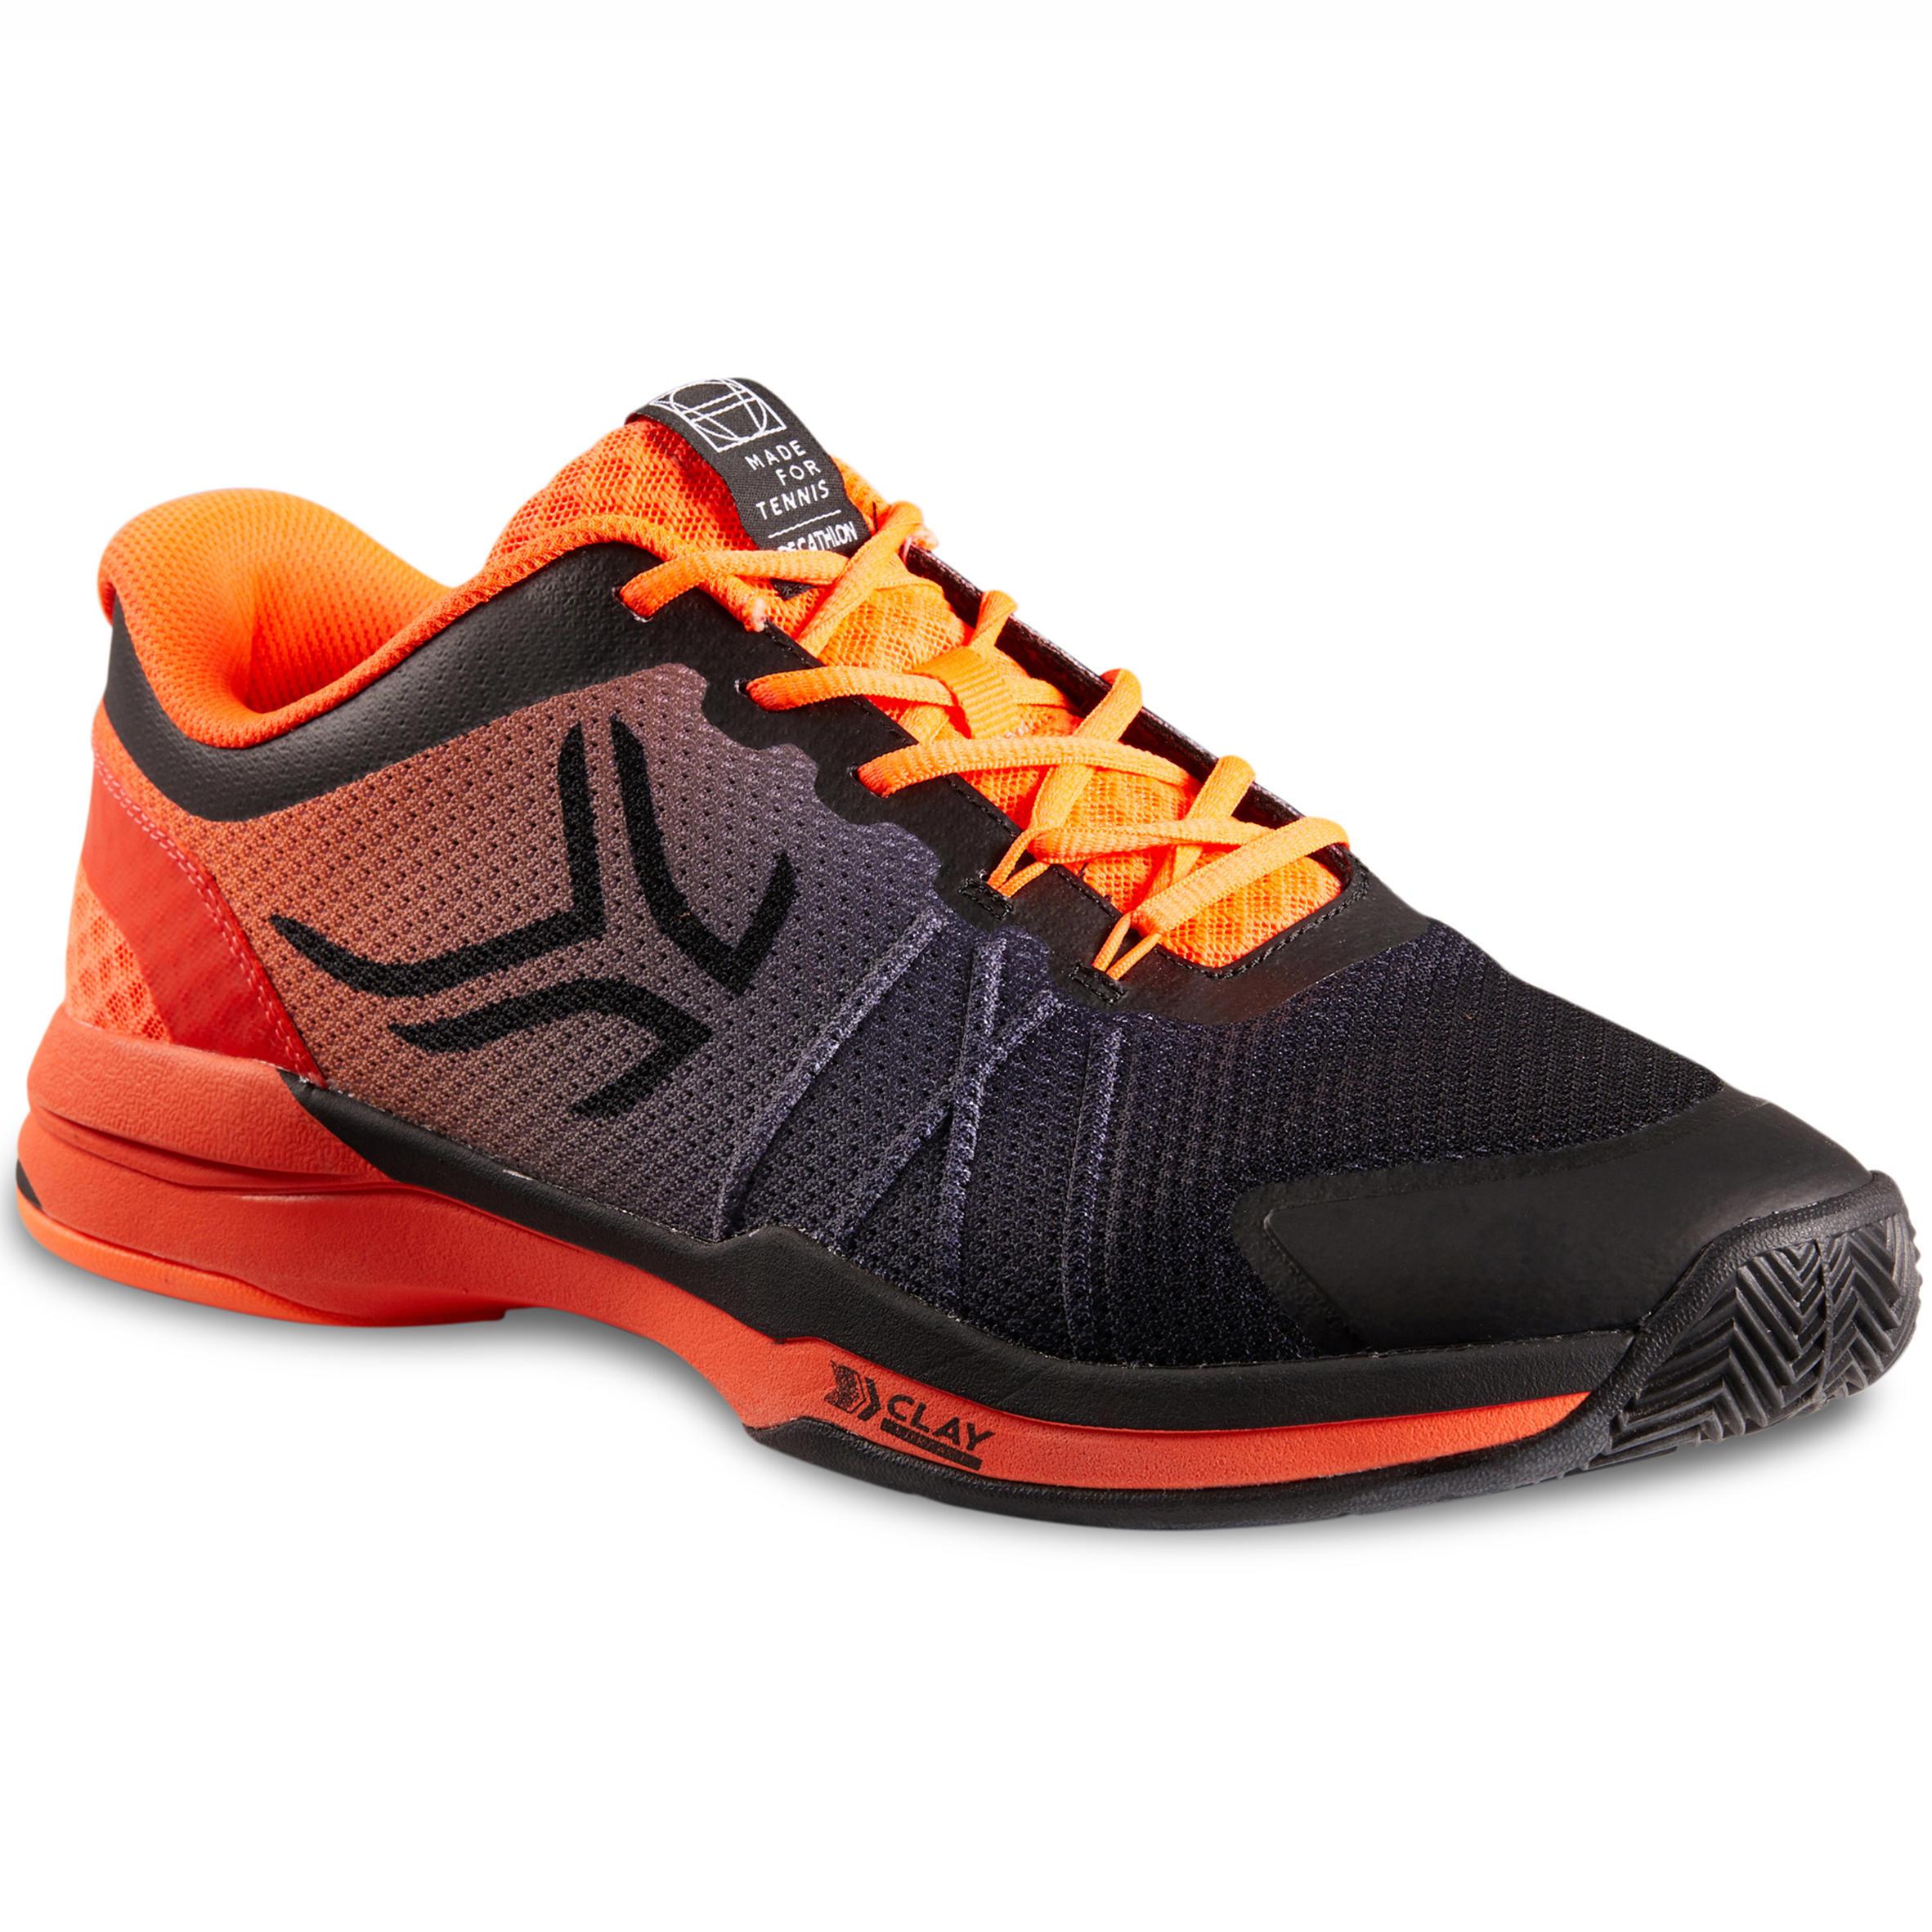 Men's Clay Court Tennis Shoes TS590